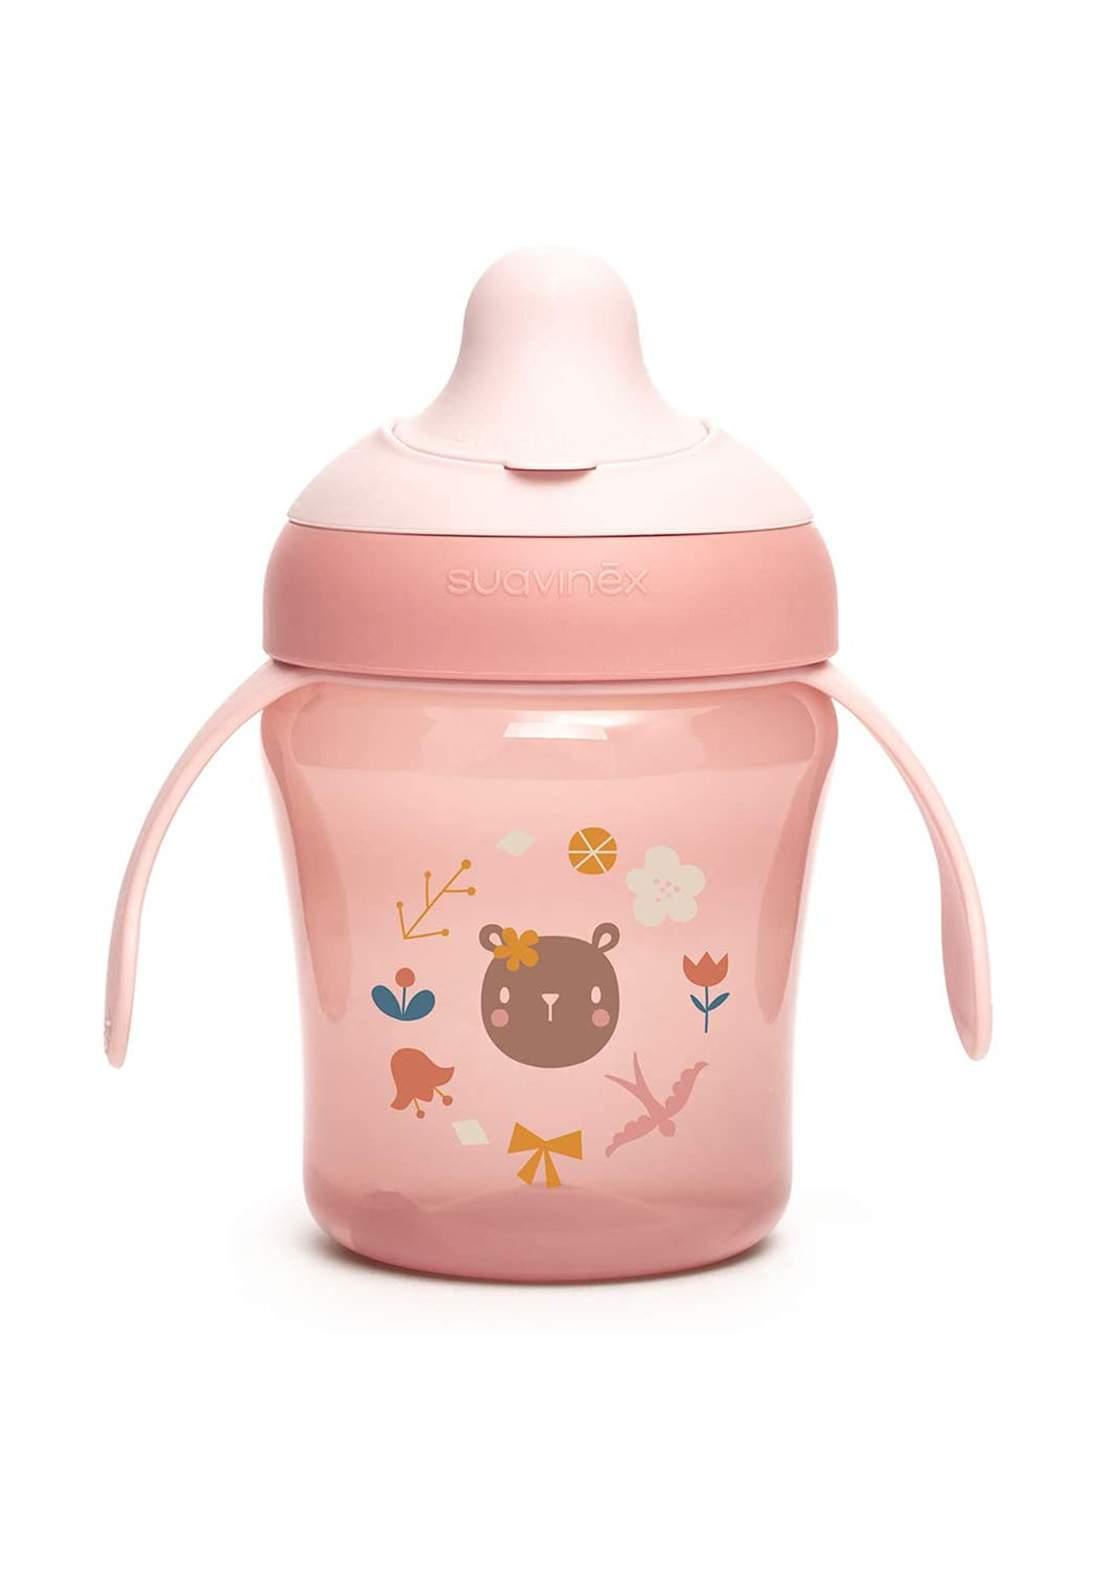 Suavinex Baby learning Cup 200 ml قدح للاطفال